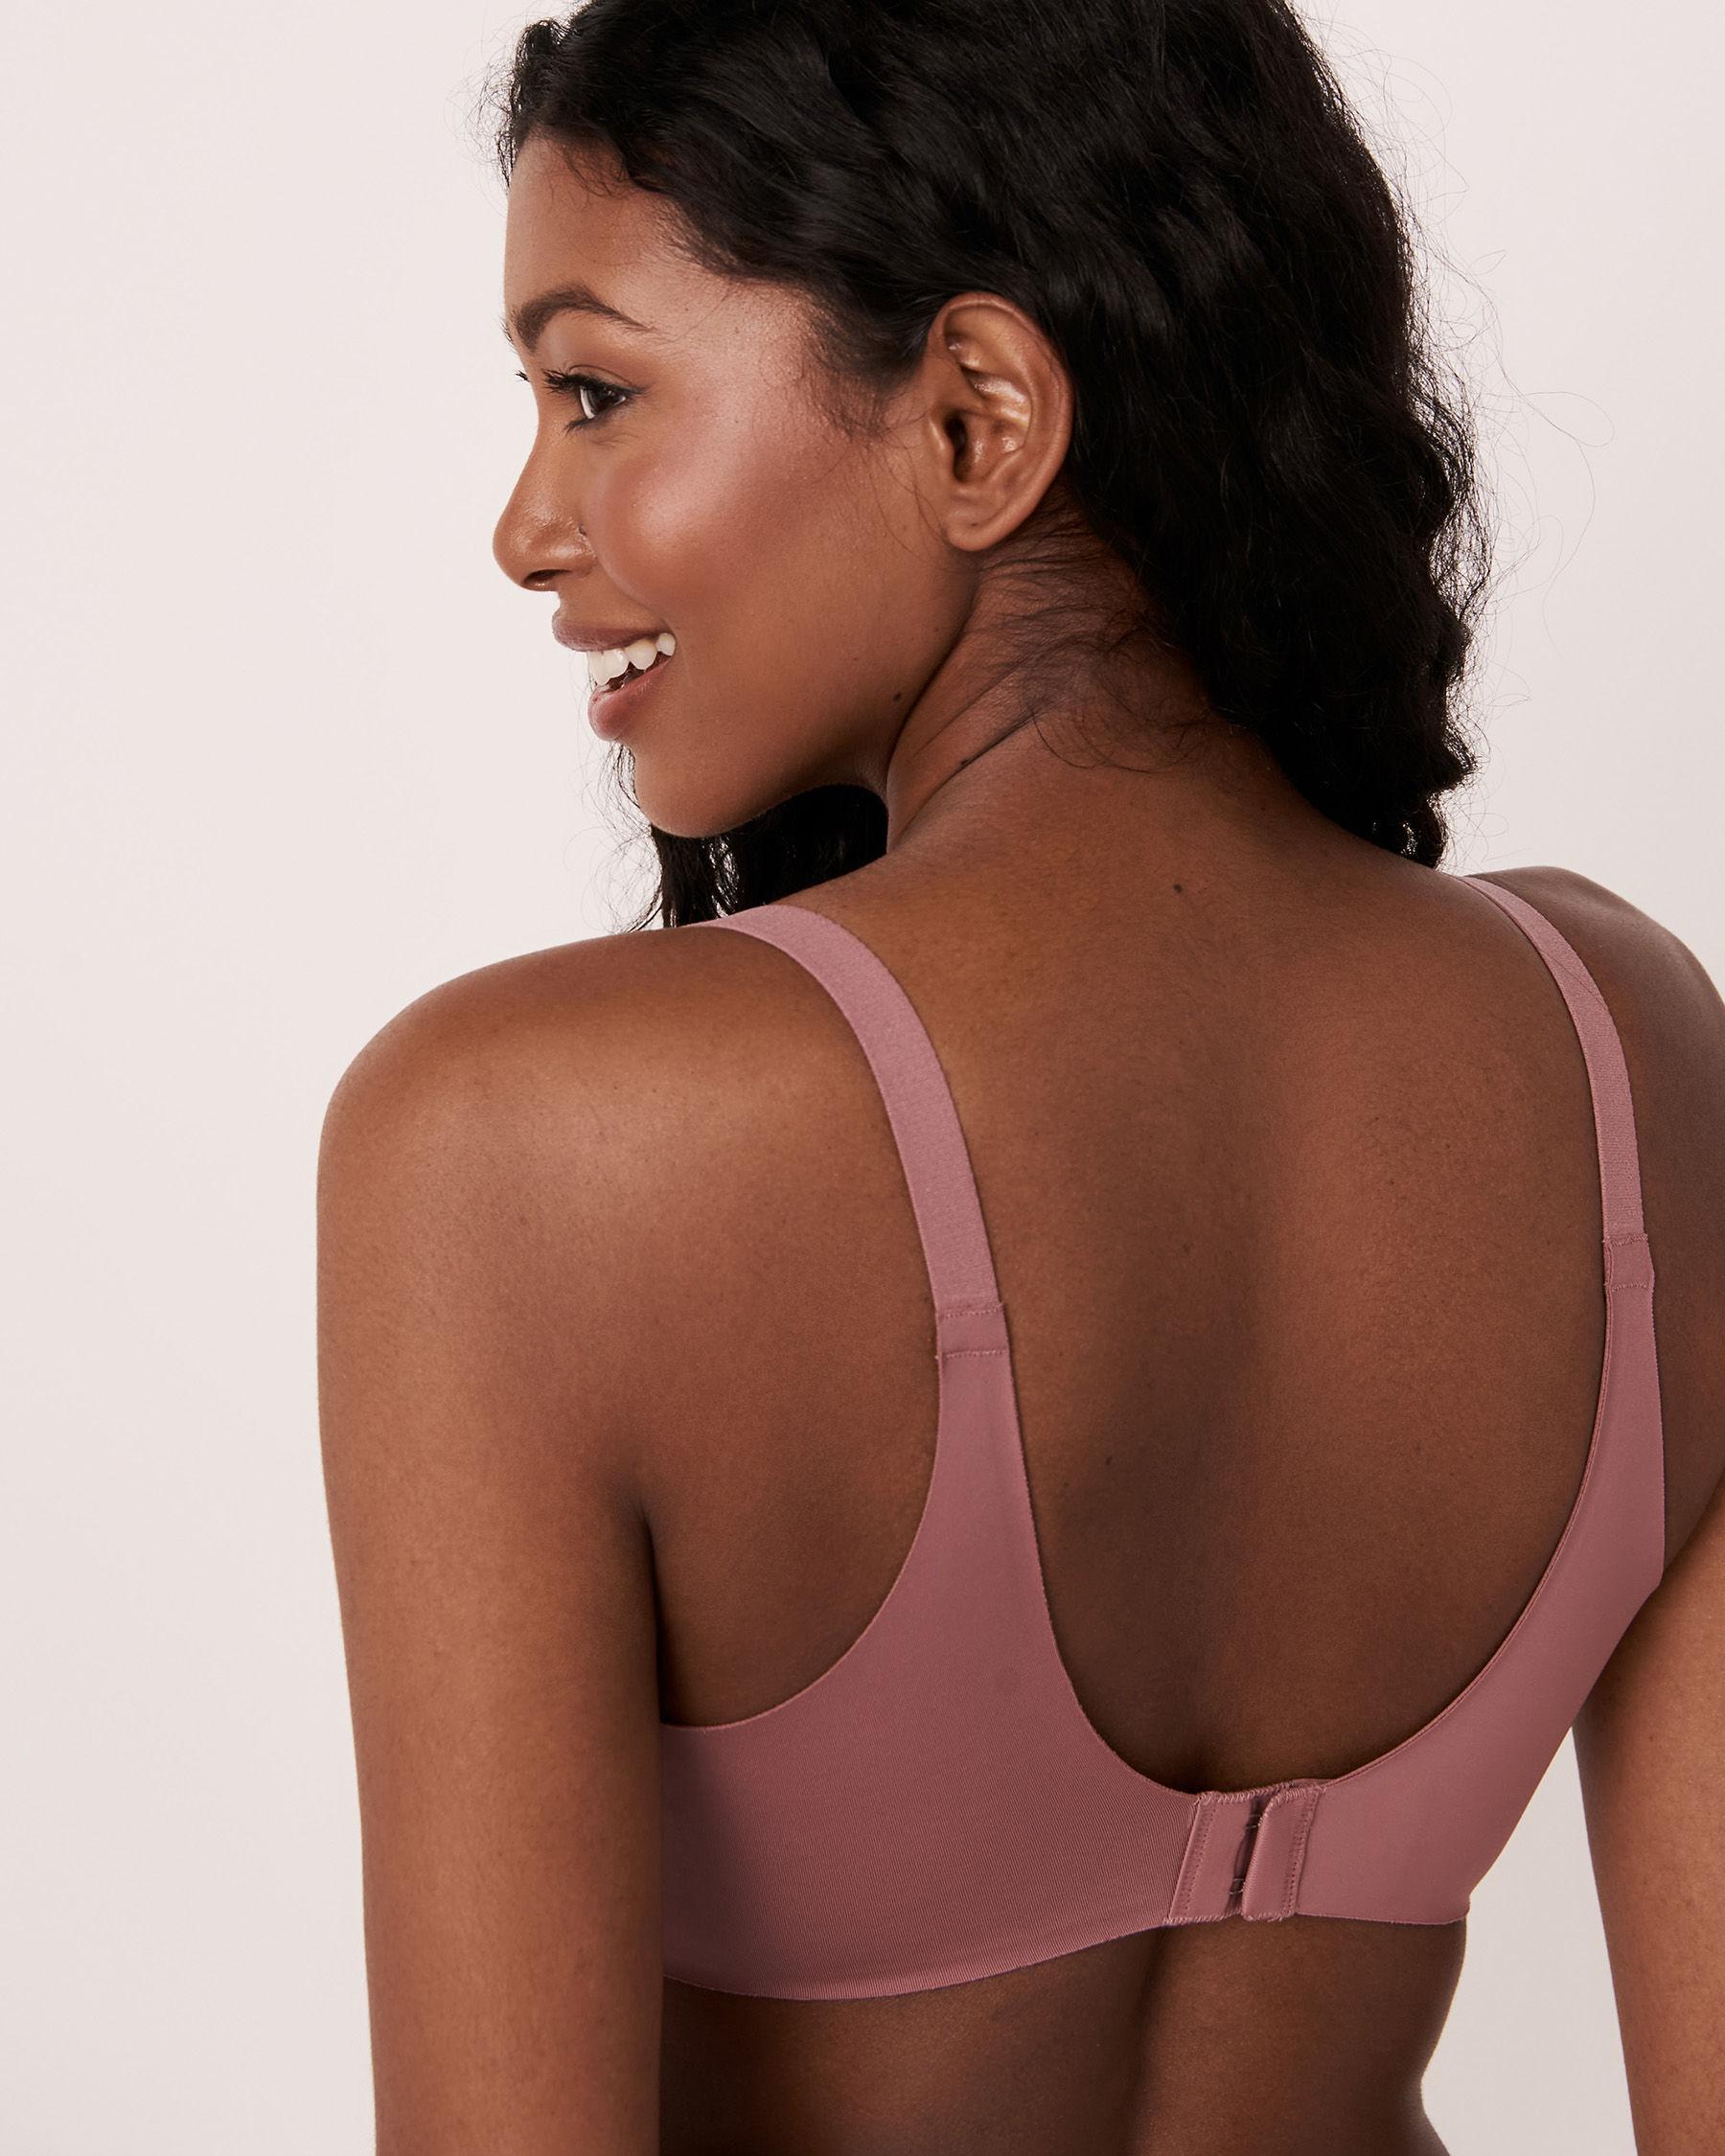 LA VIE EN ROSE Lightly Lined Sleek Back Bra Old pink 10200072 - View2